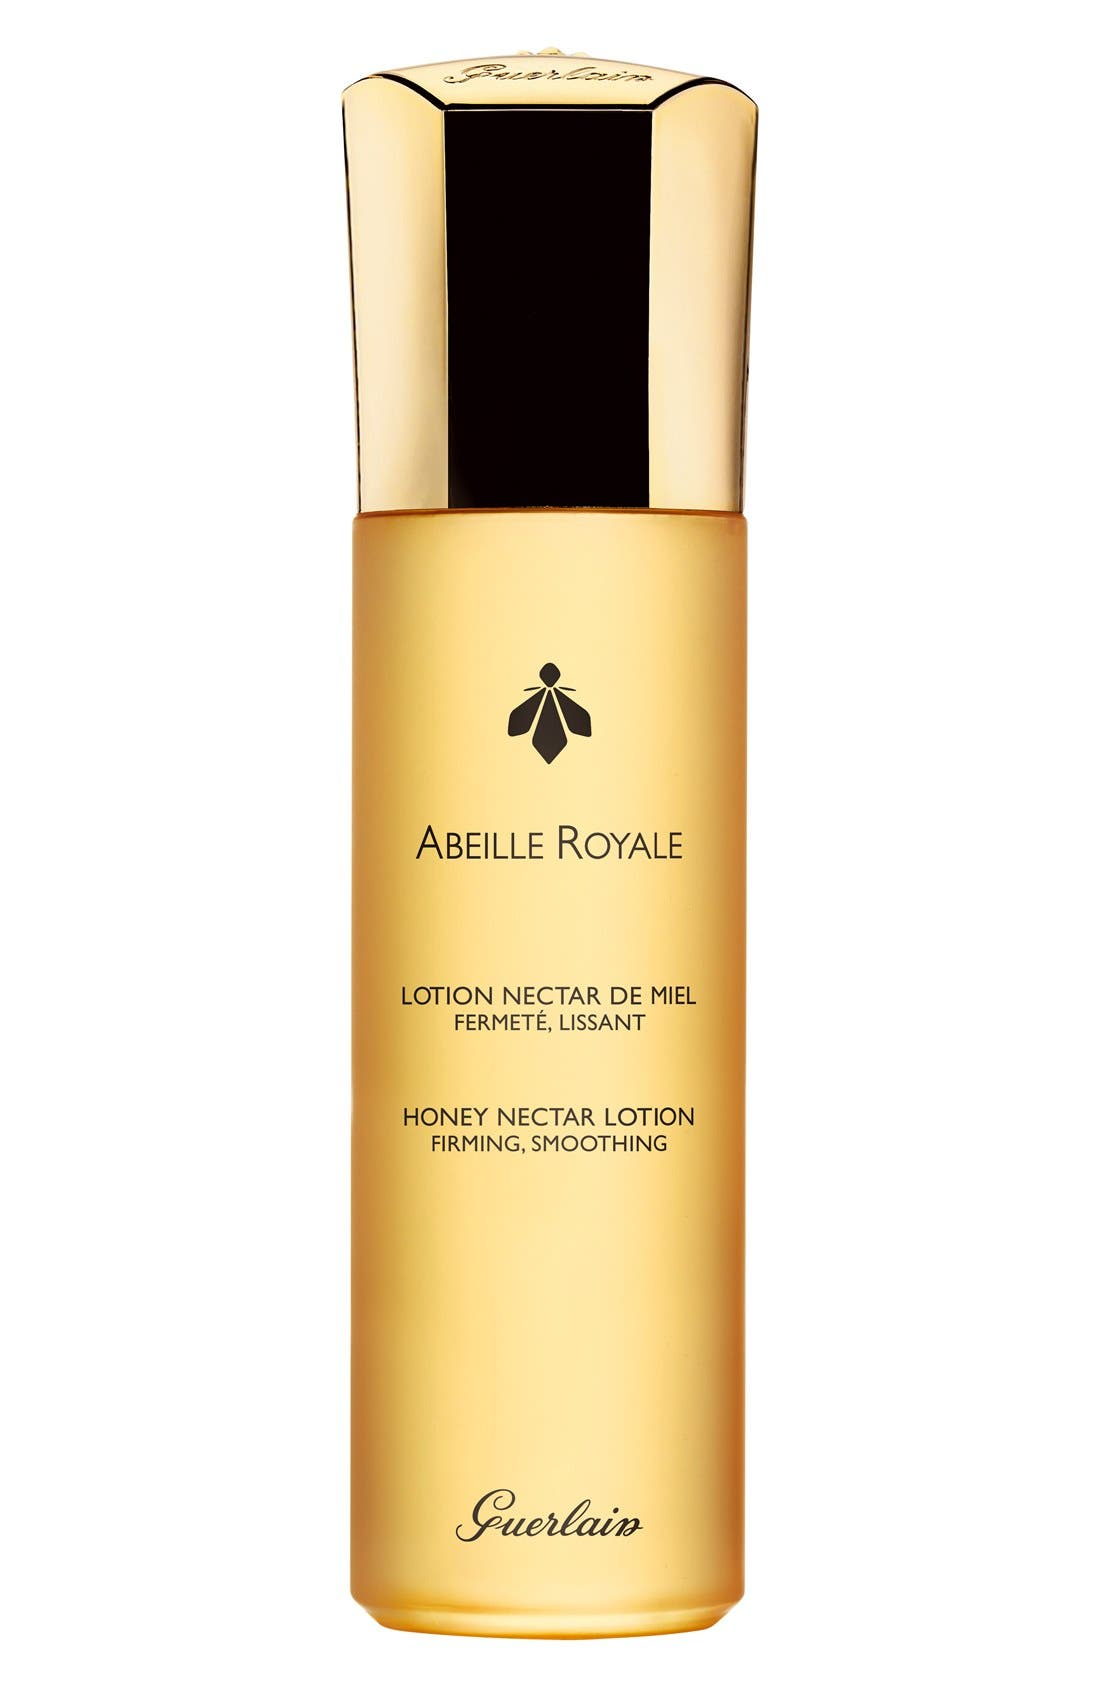 Guerlain 'Abeille Royale' Honey Nectar Lotion